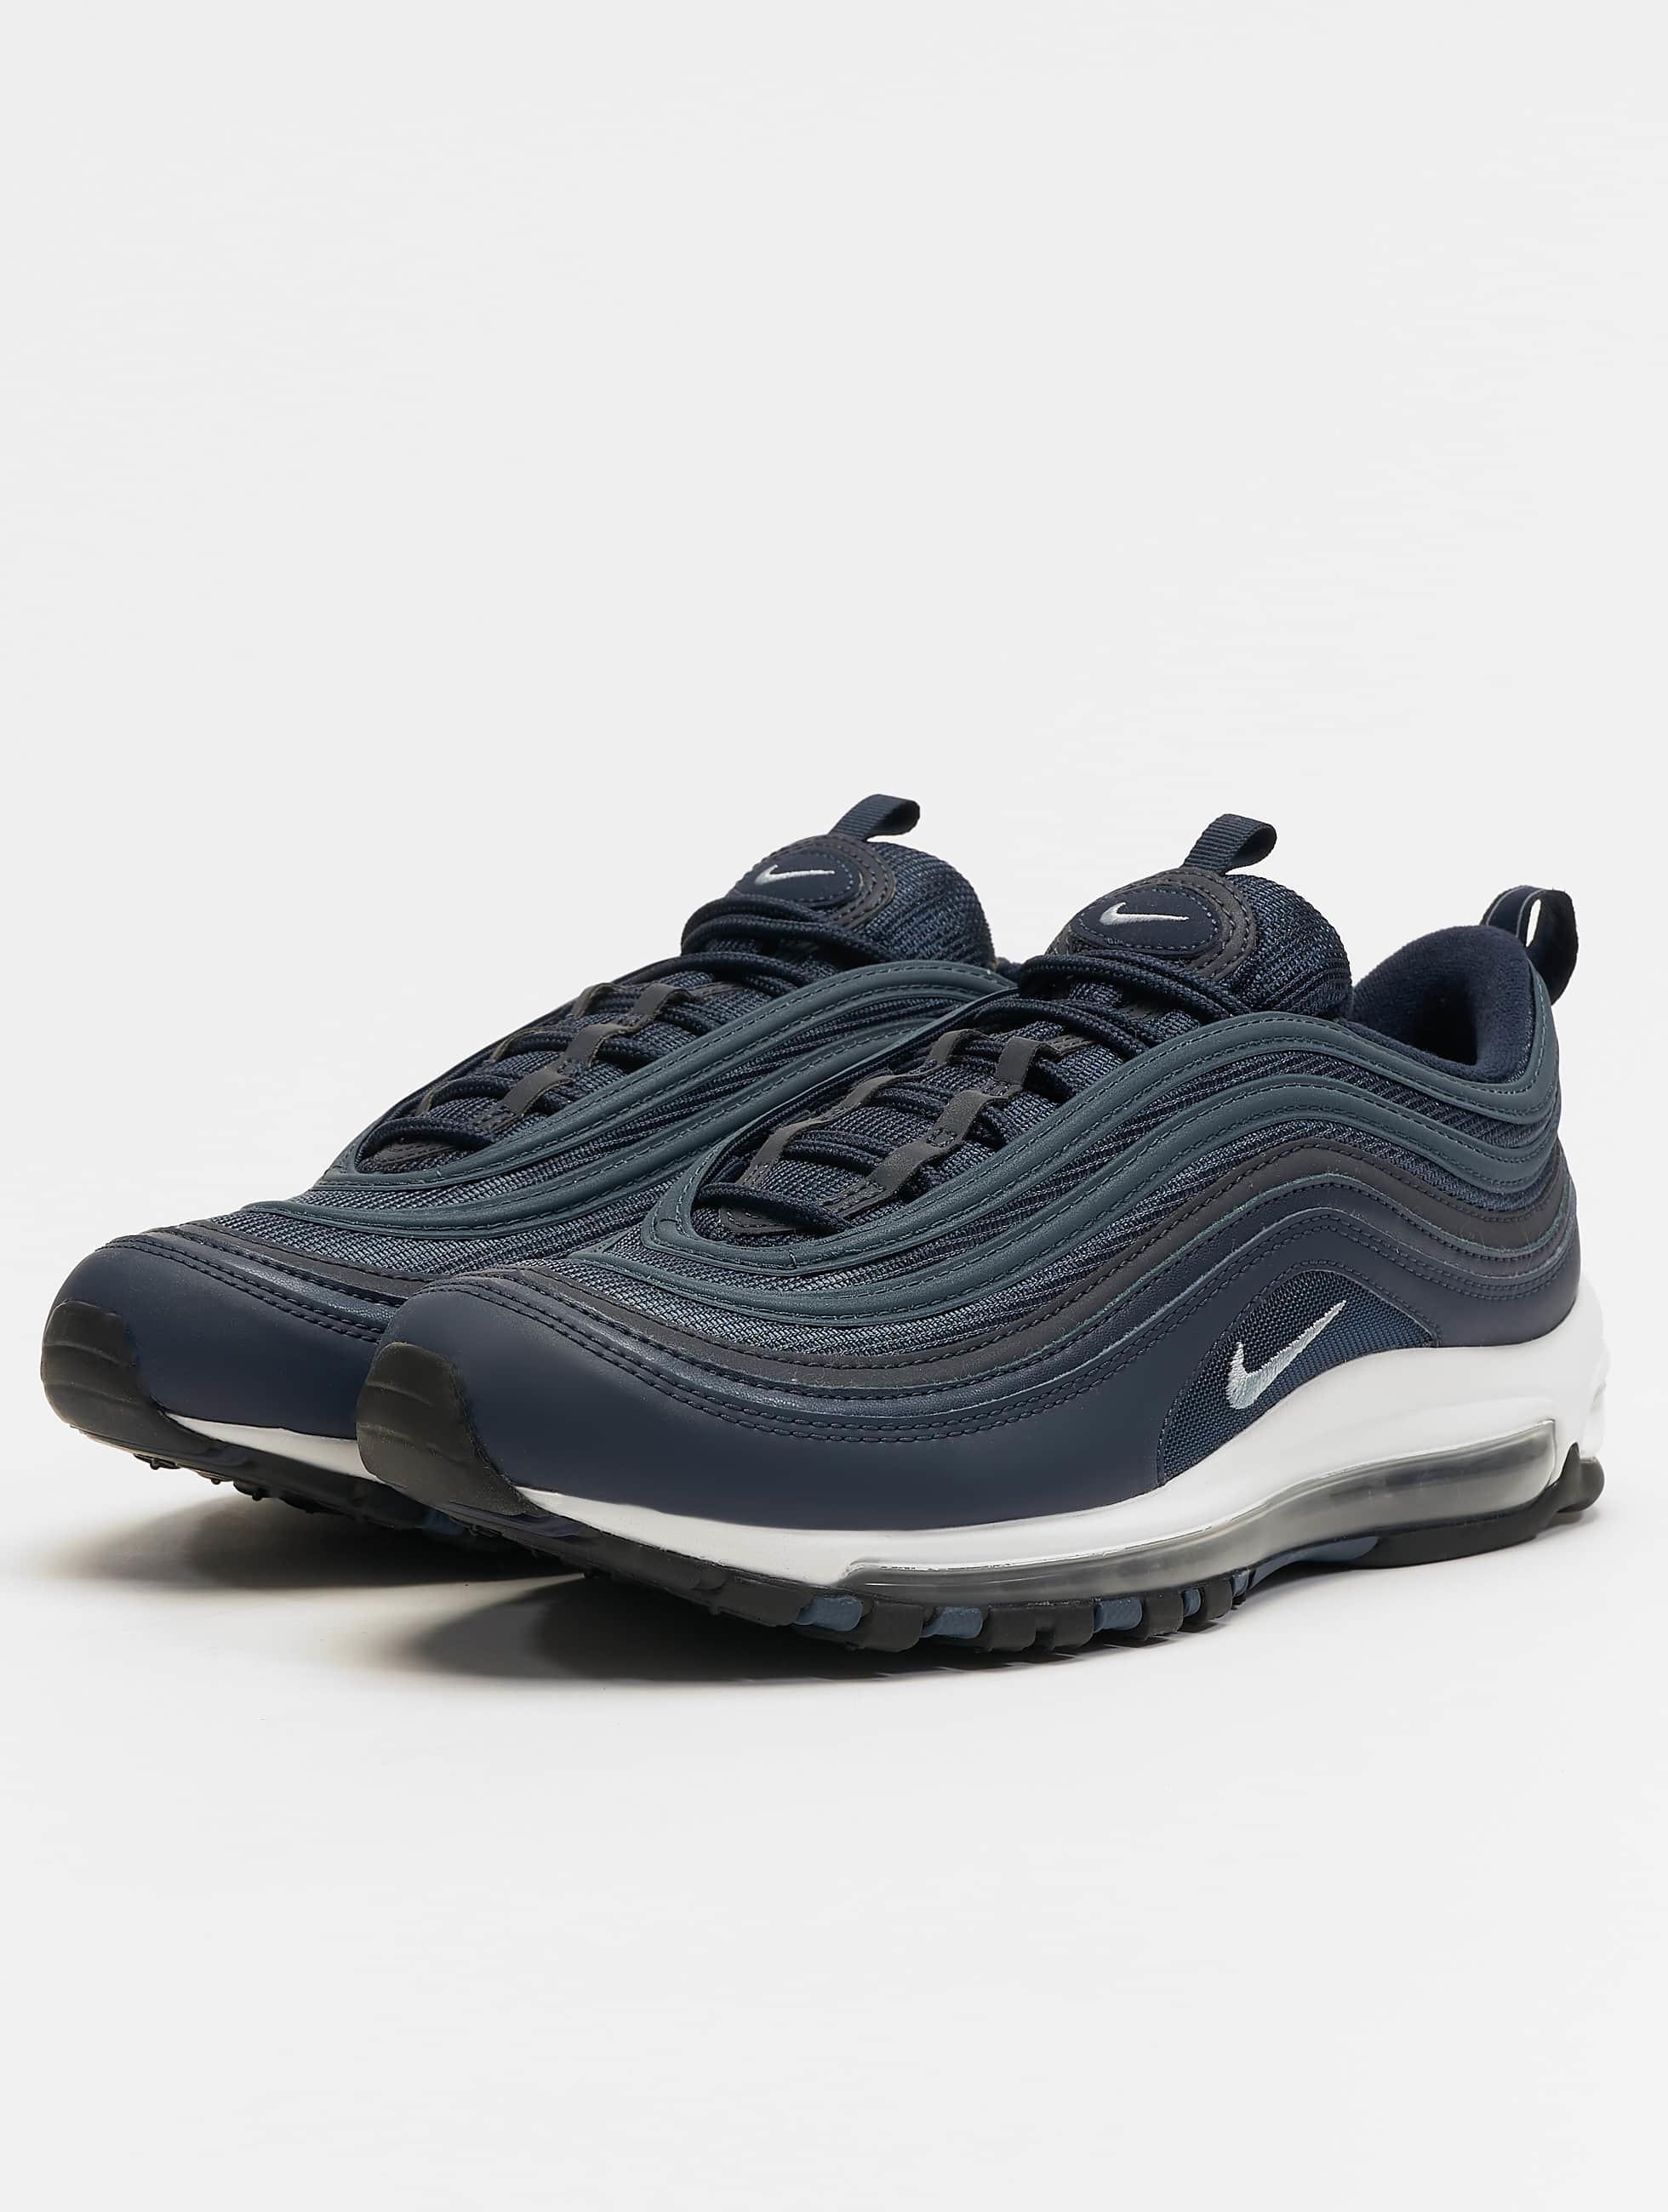 bb5e29d2a44 Nike schoen / sneaker Air Max 97 in blauw 653672